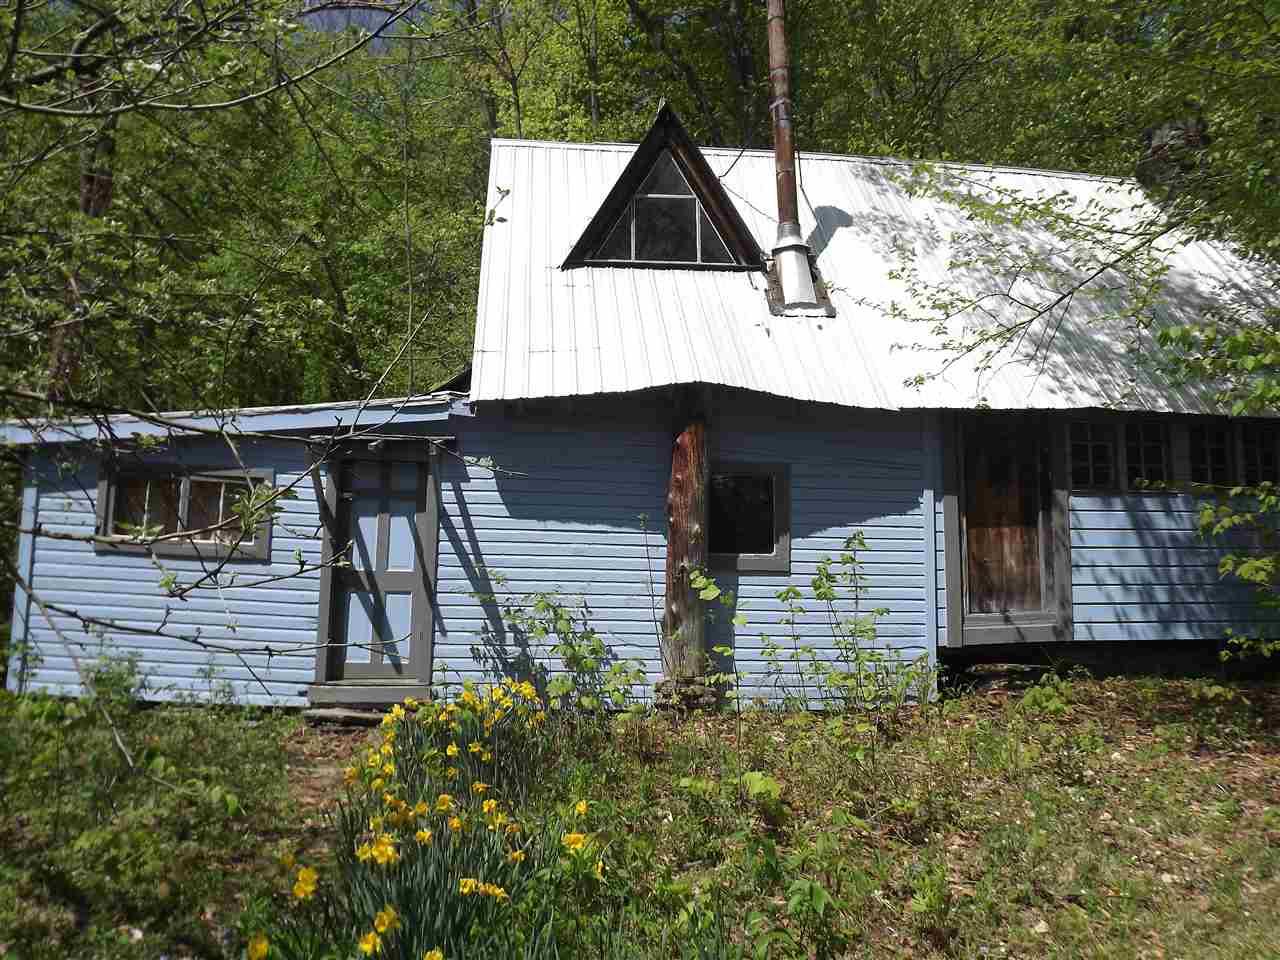 240 Merrill Farm Road, Roxbury, VT 05669